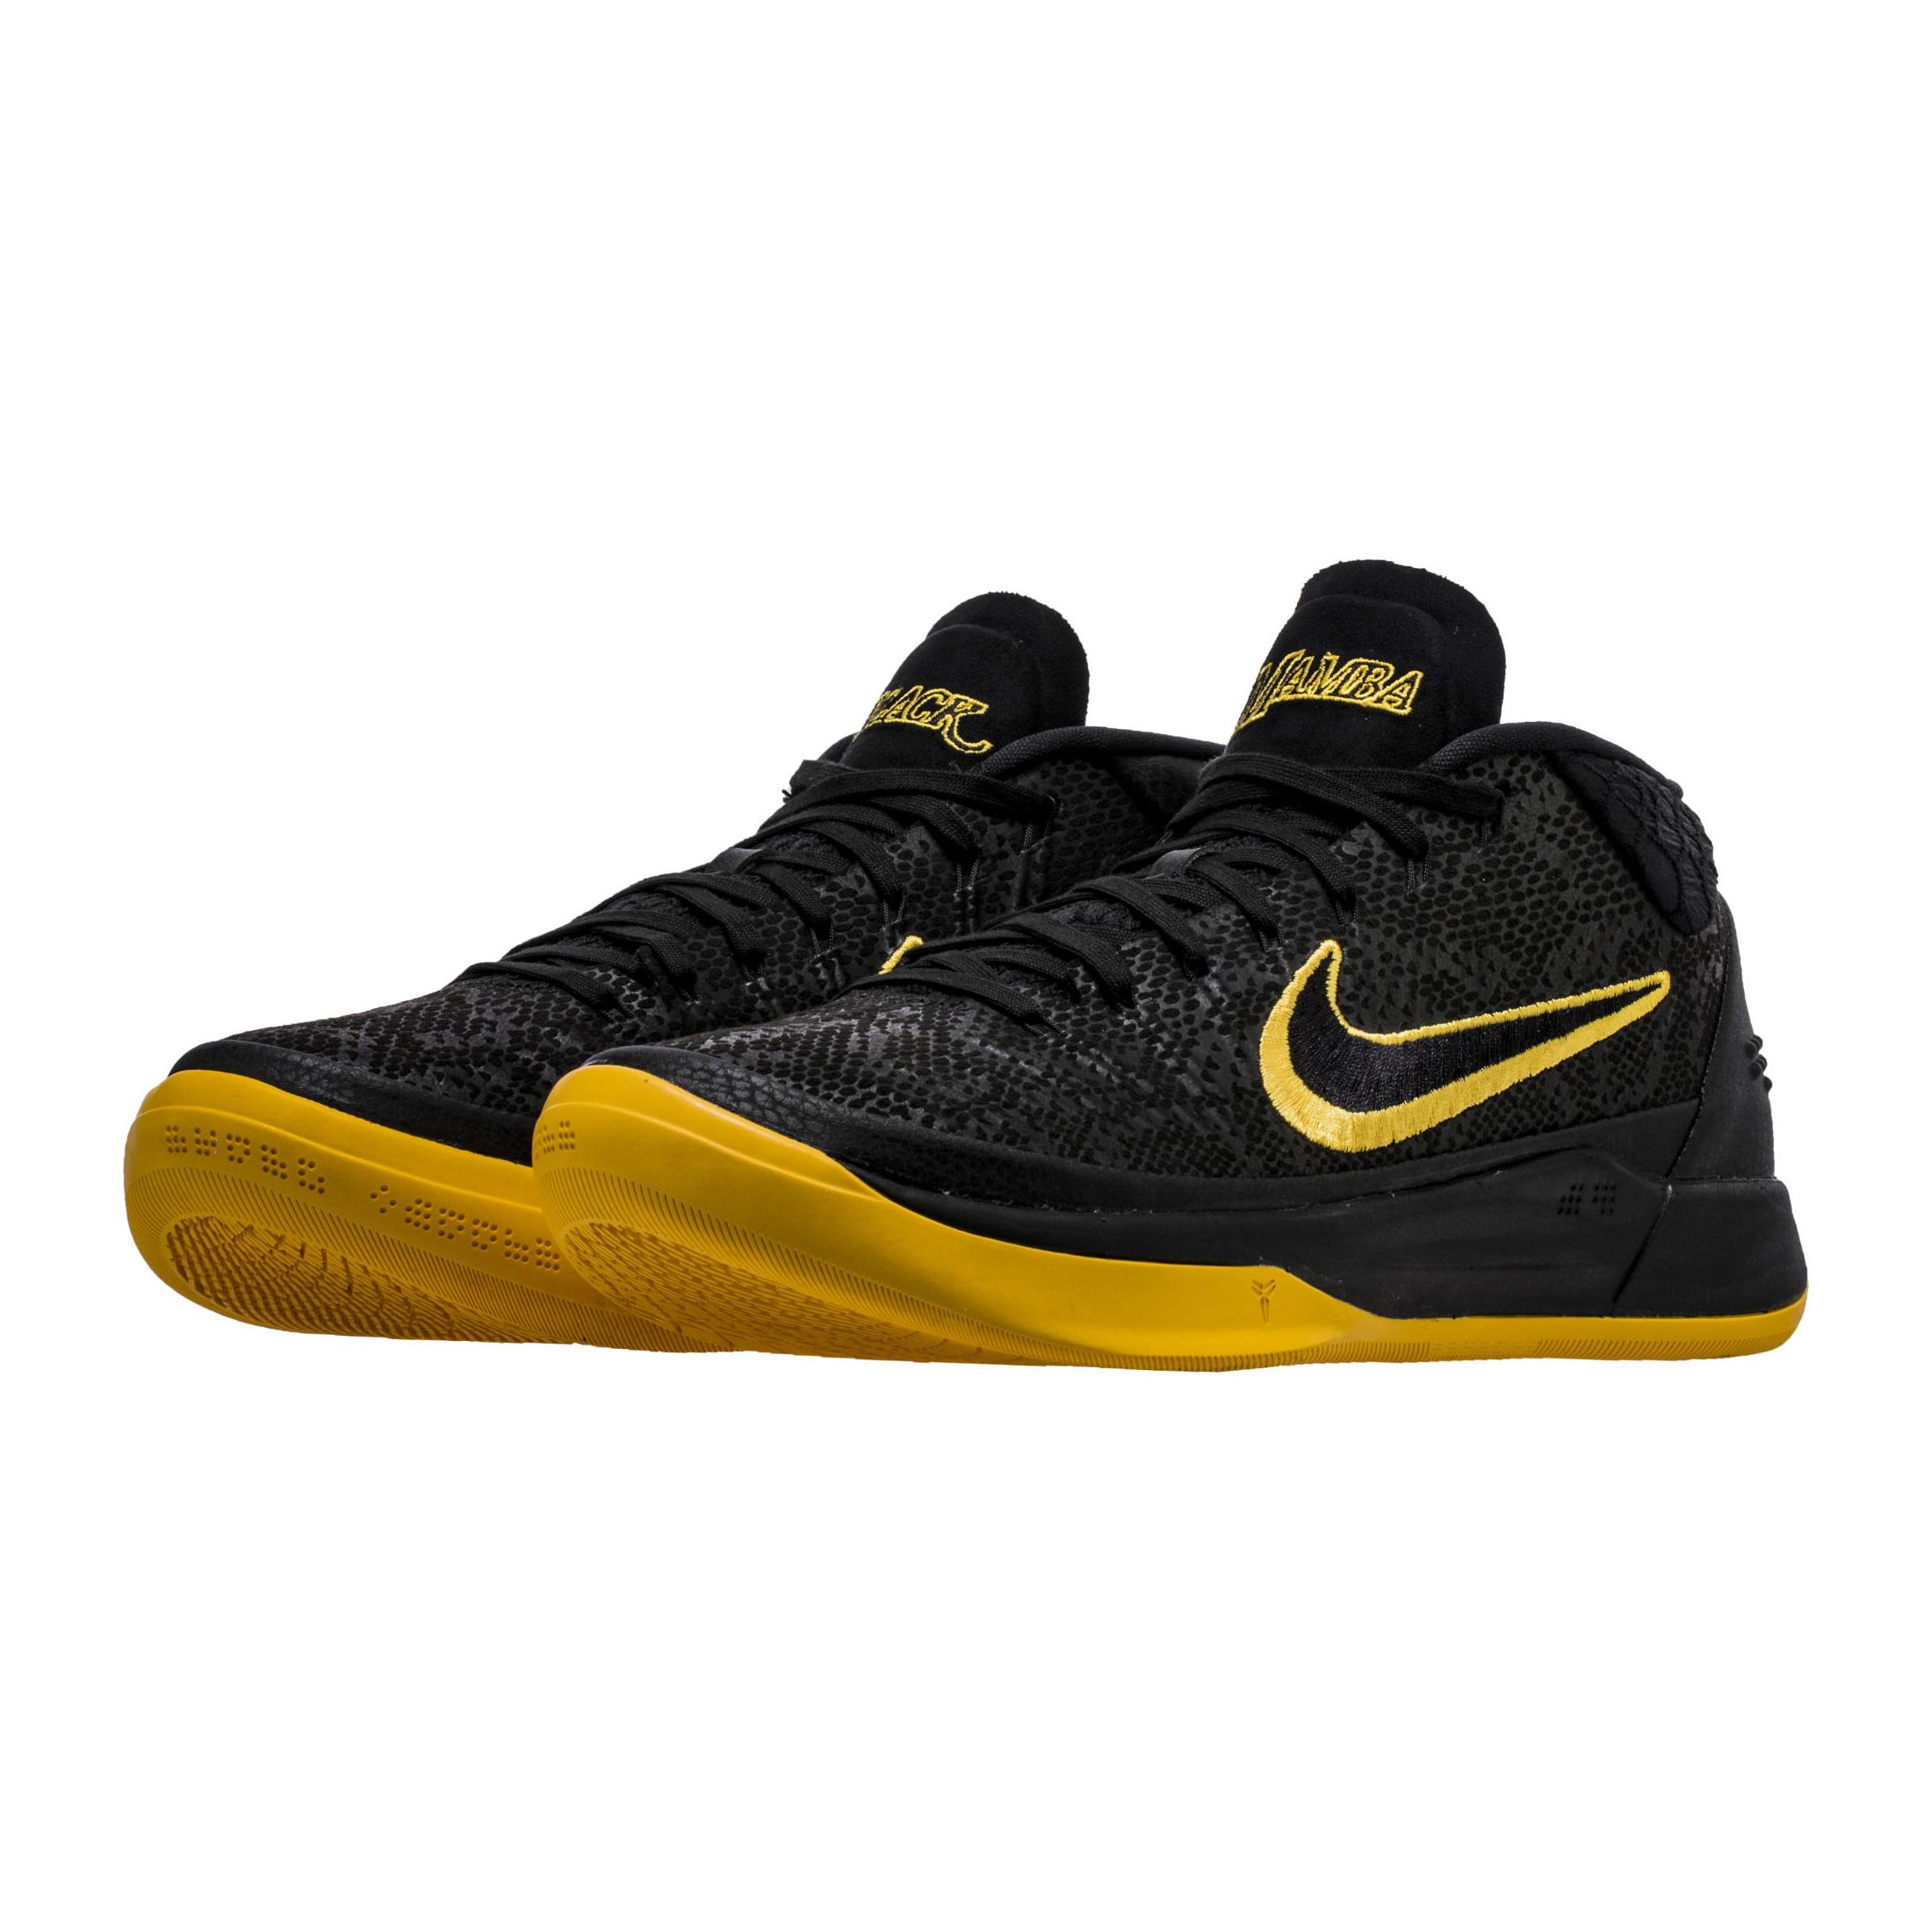 Nike Kobe AD Black Mamba City Edition 1